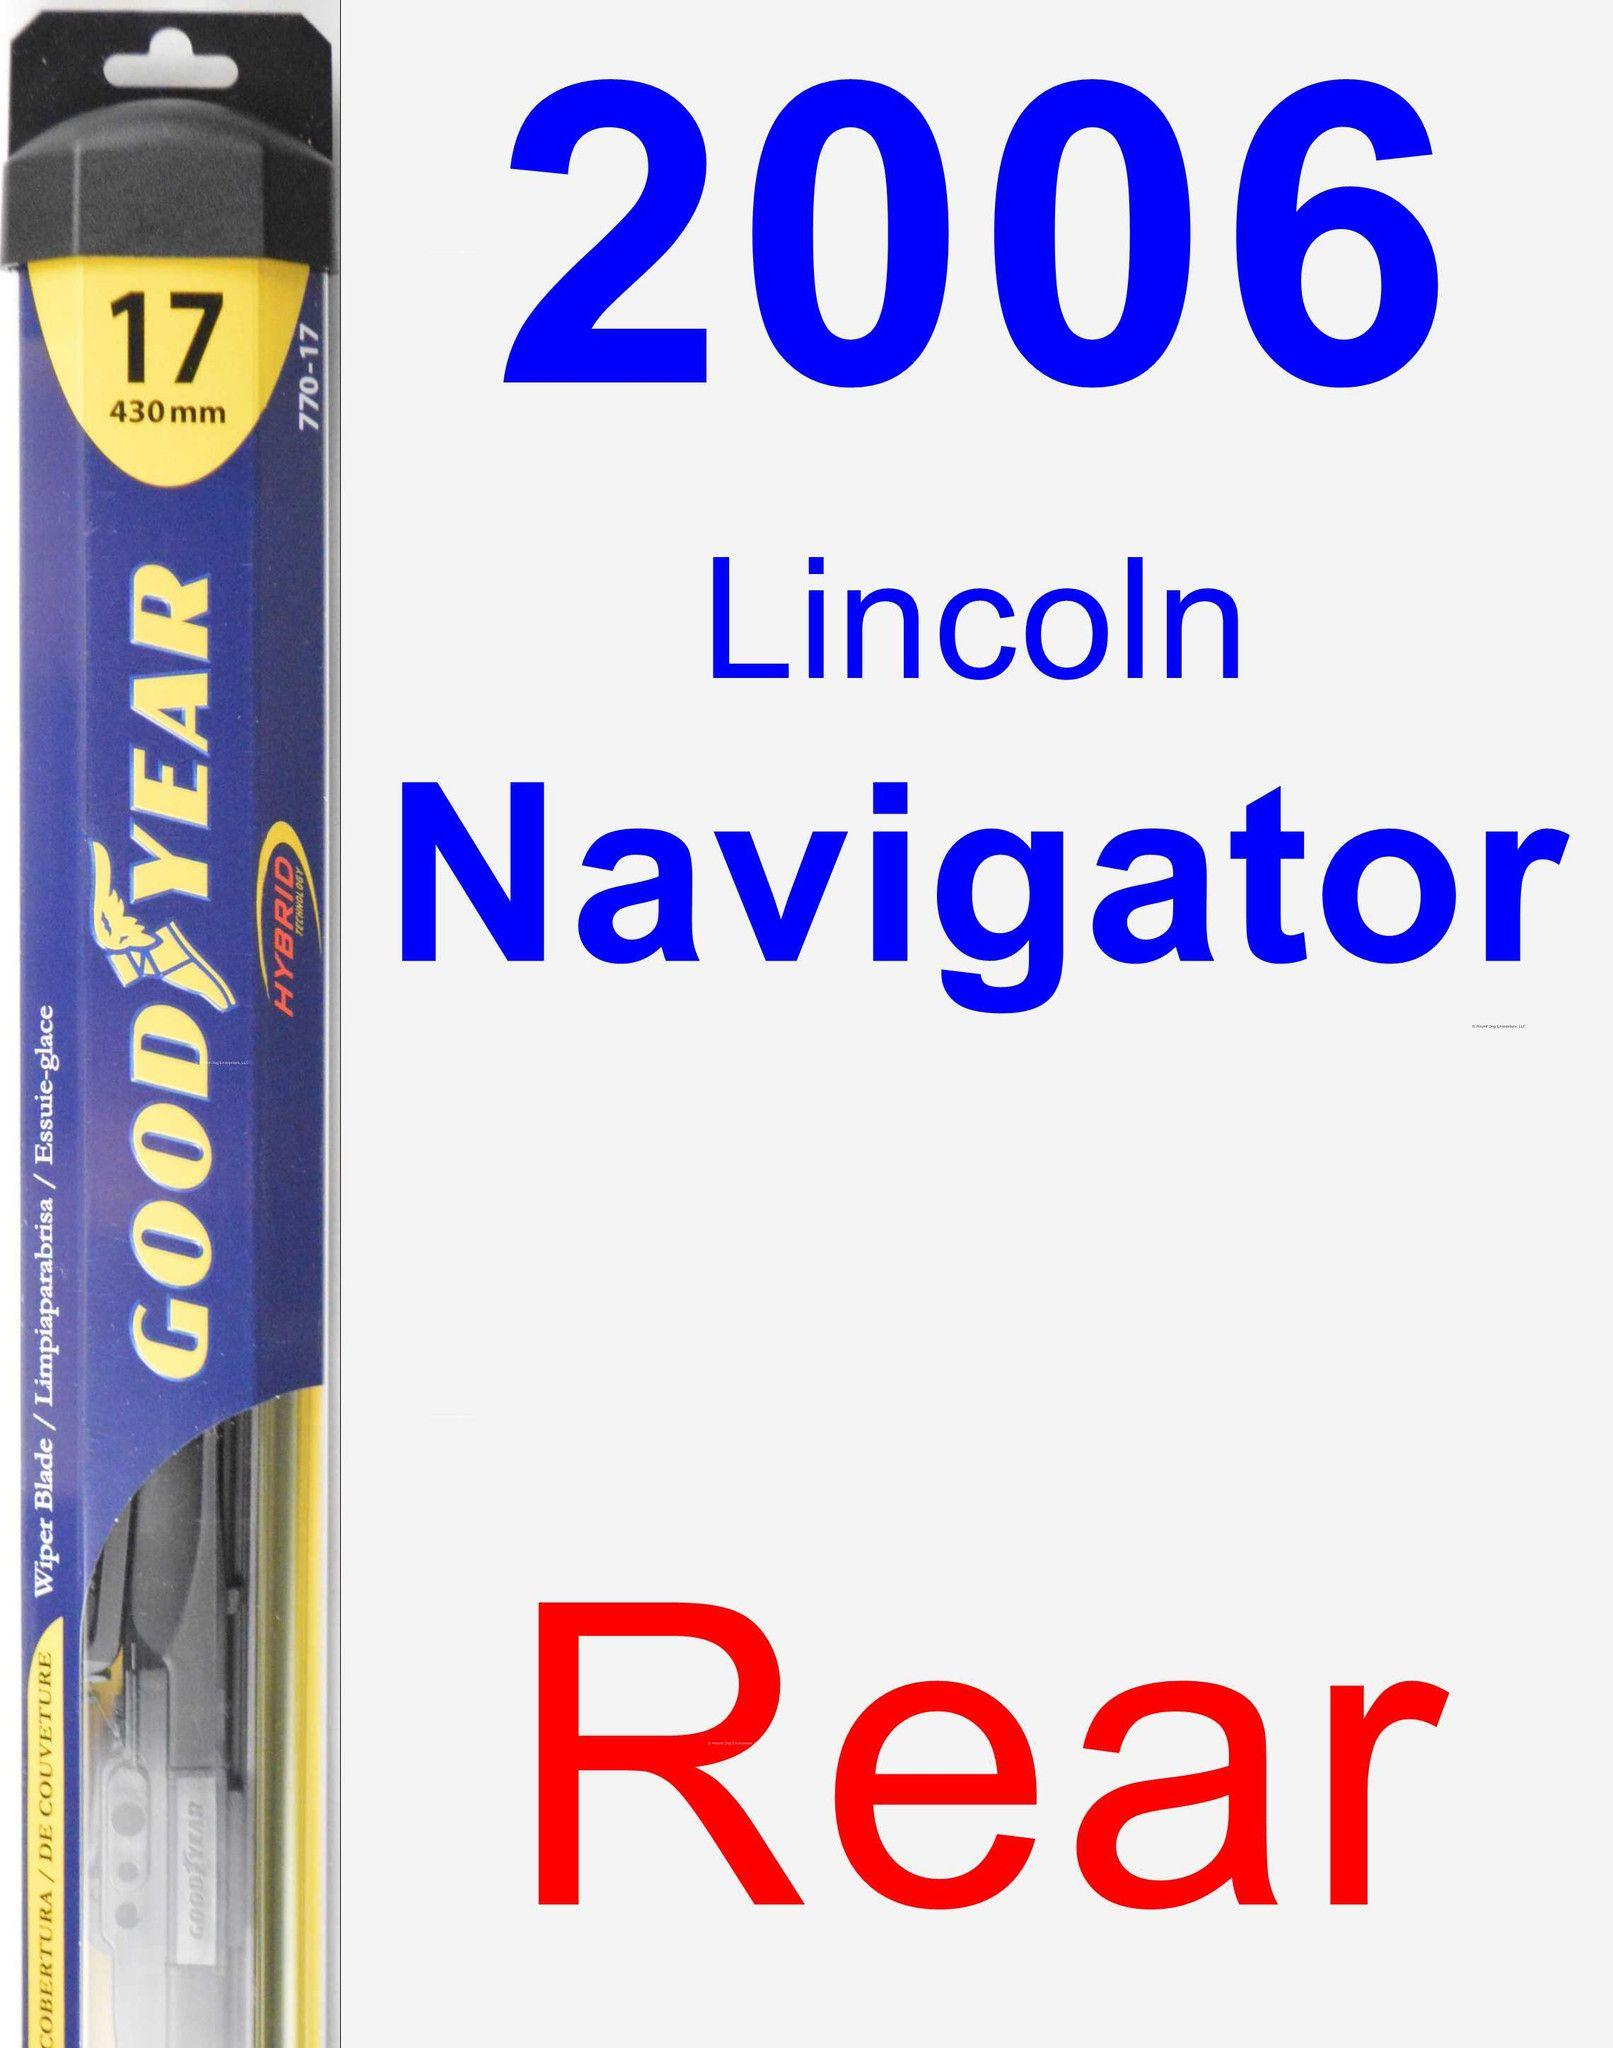 Rear Wiper Blade For 2006 Lincoln Navigator Hybrid Buick Roadmaster Chrysler Concorde Pontiac Montana